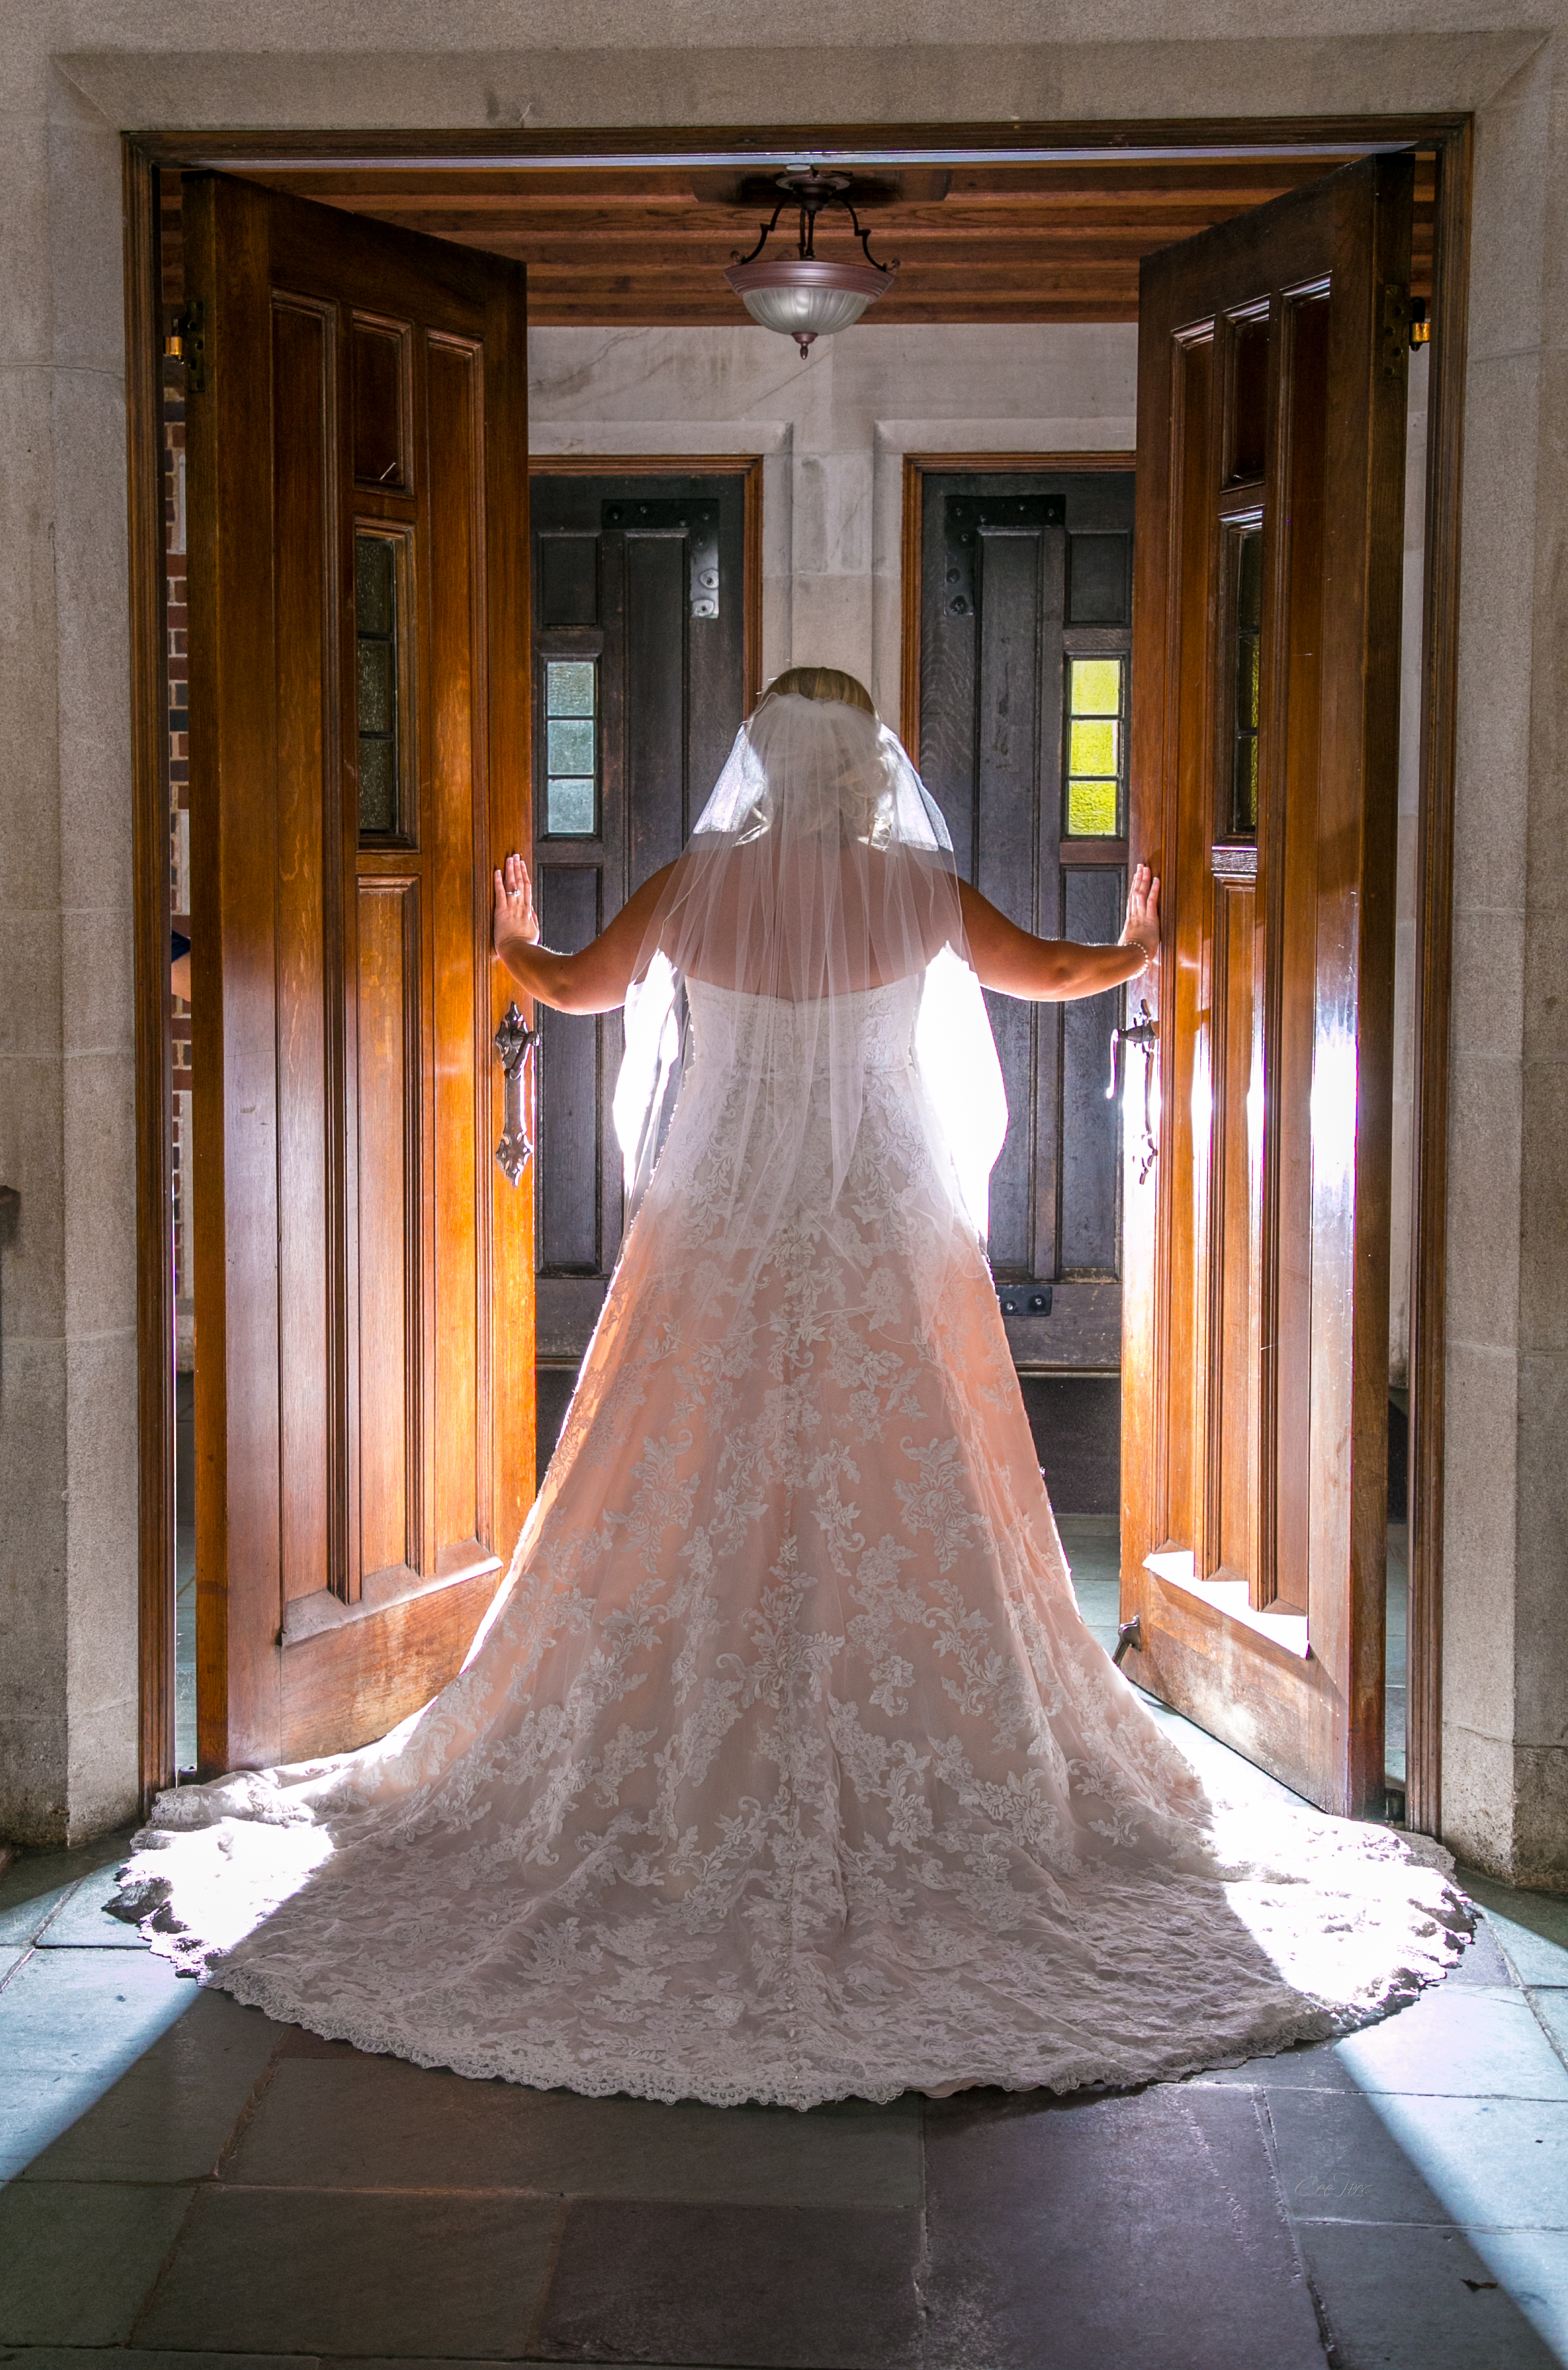 Nashville_Wedding_Photographer_Photography_DJ_MC_Lighting_Photobooth_Franklin_Bowling_Gallatin3-21.jpg